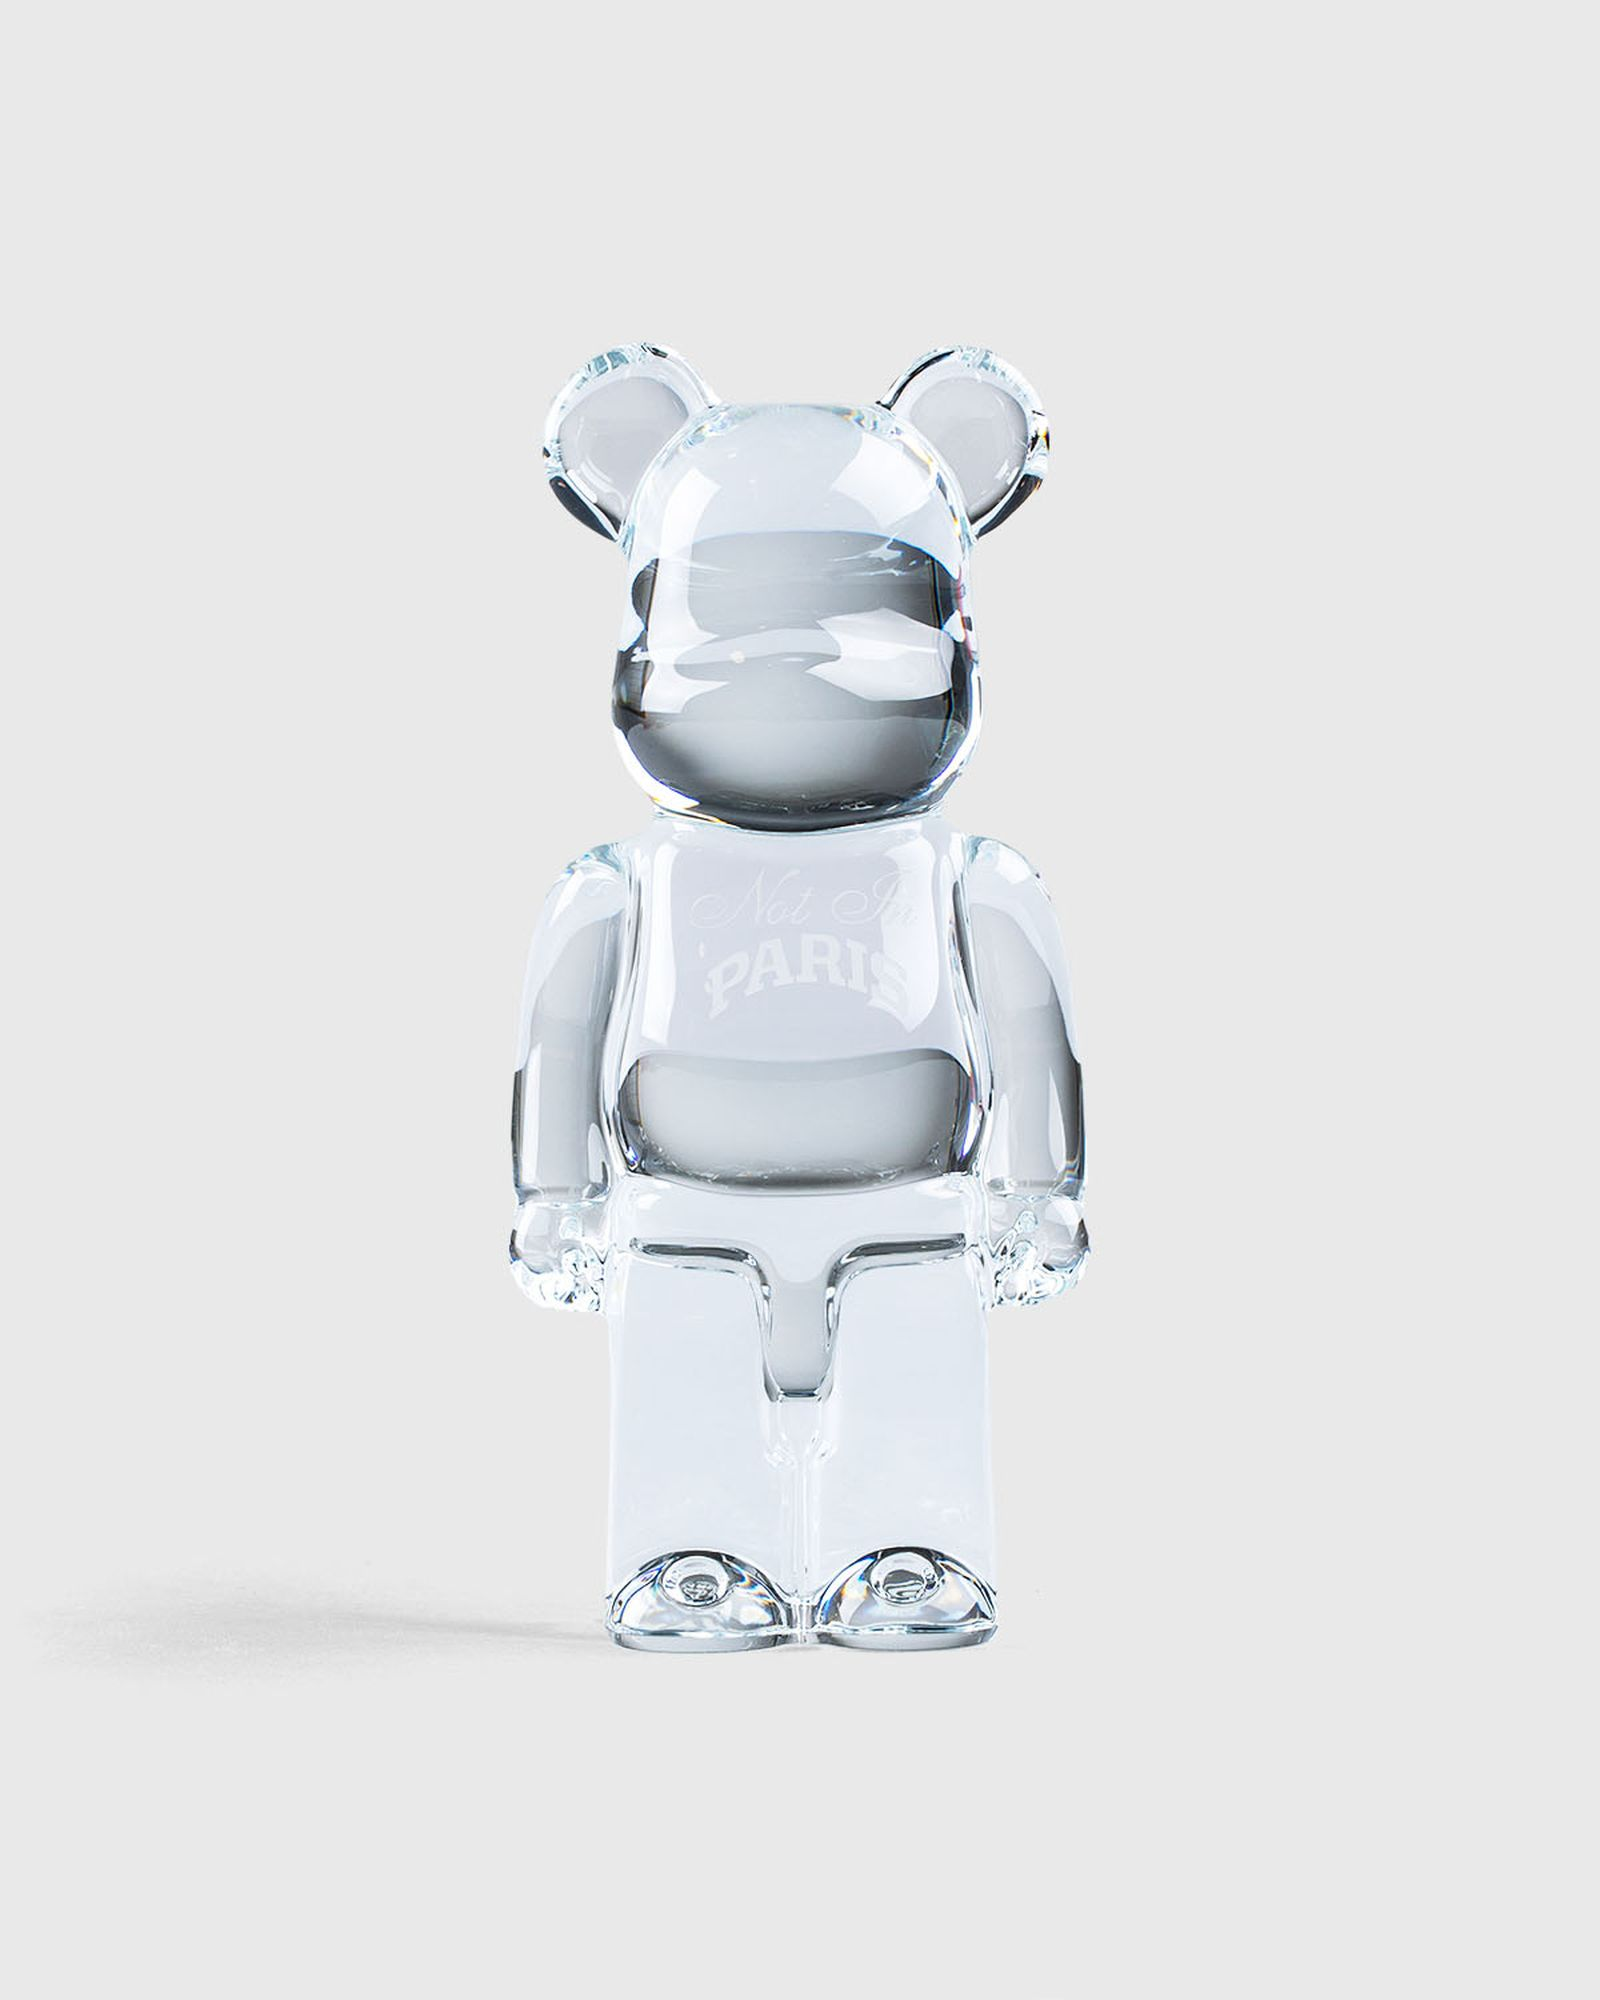 not-in-paris-releases-medicom-toy-01